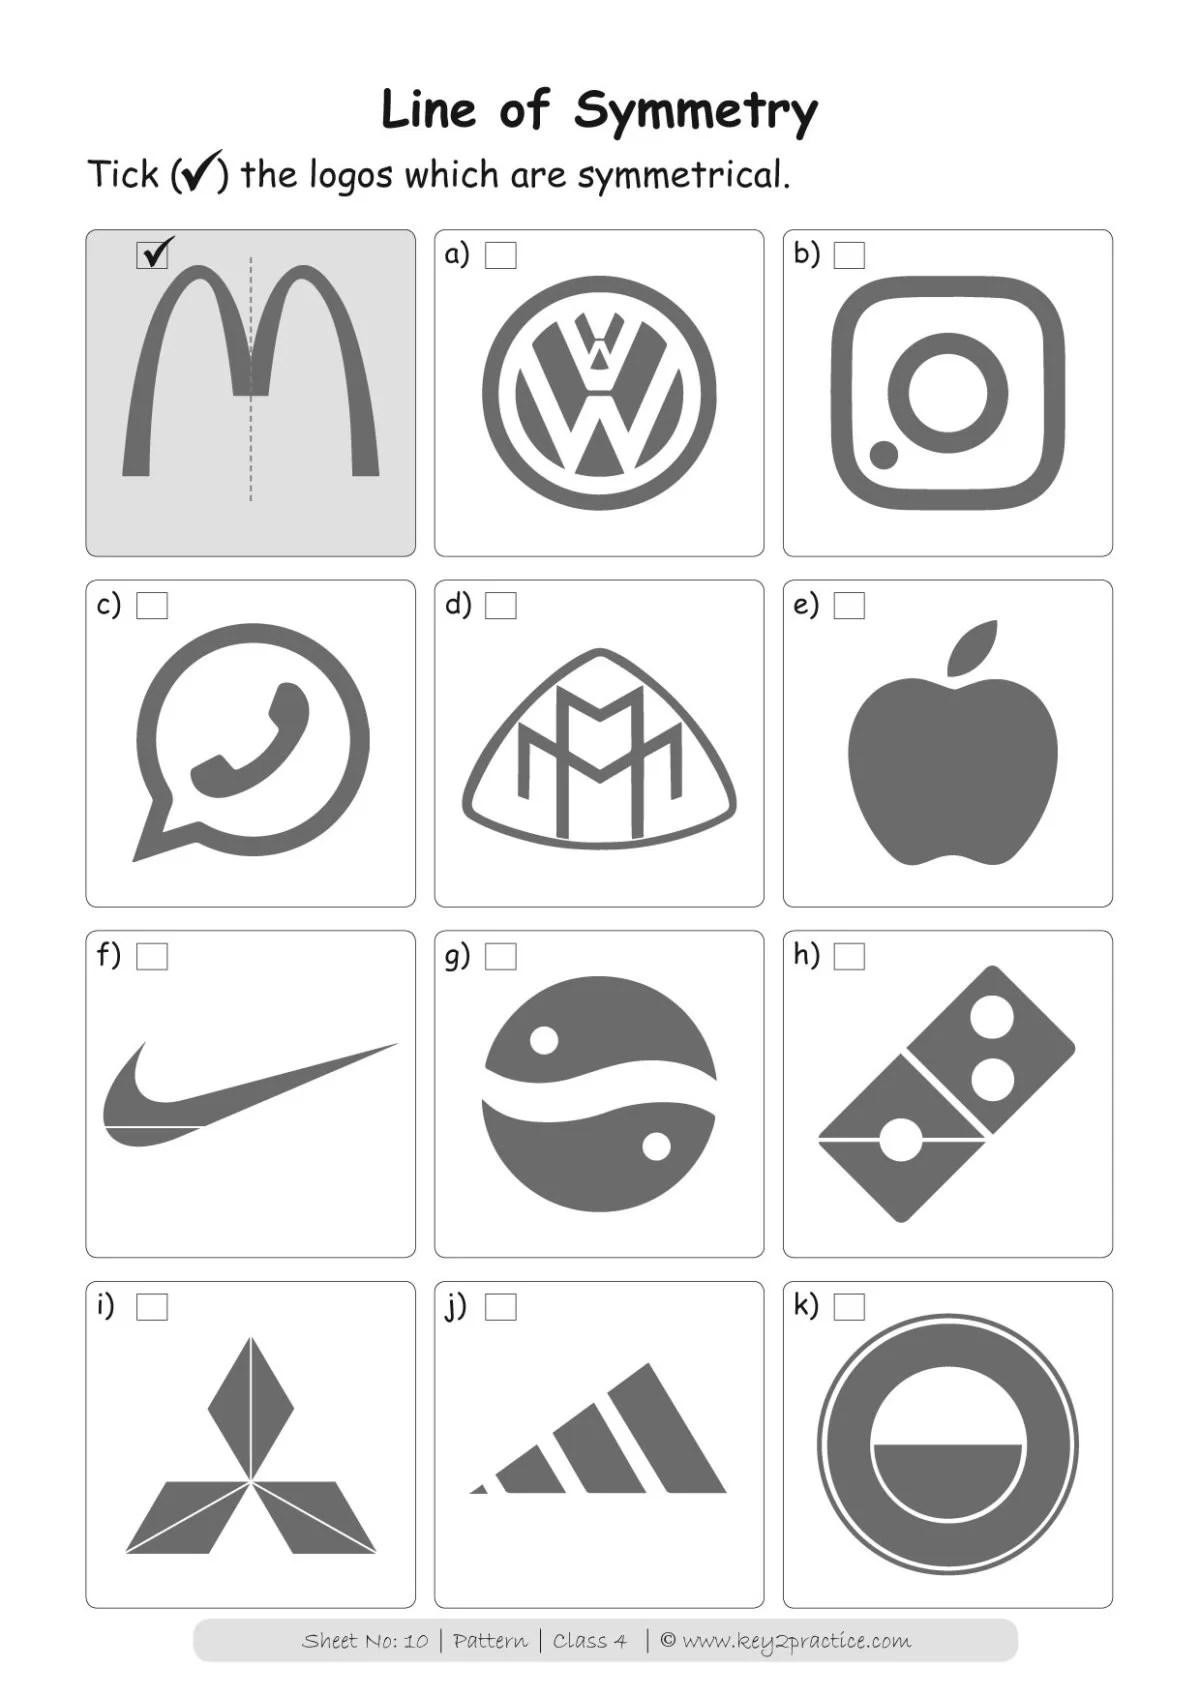 Patterns worksheets Grade 4 I Maths - key2practice Workbooks [ 1697 x 1200 Pixel ]